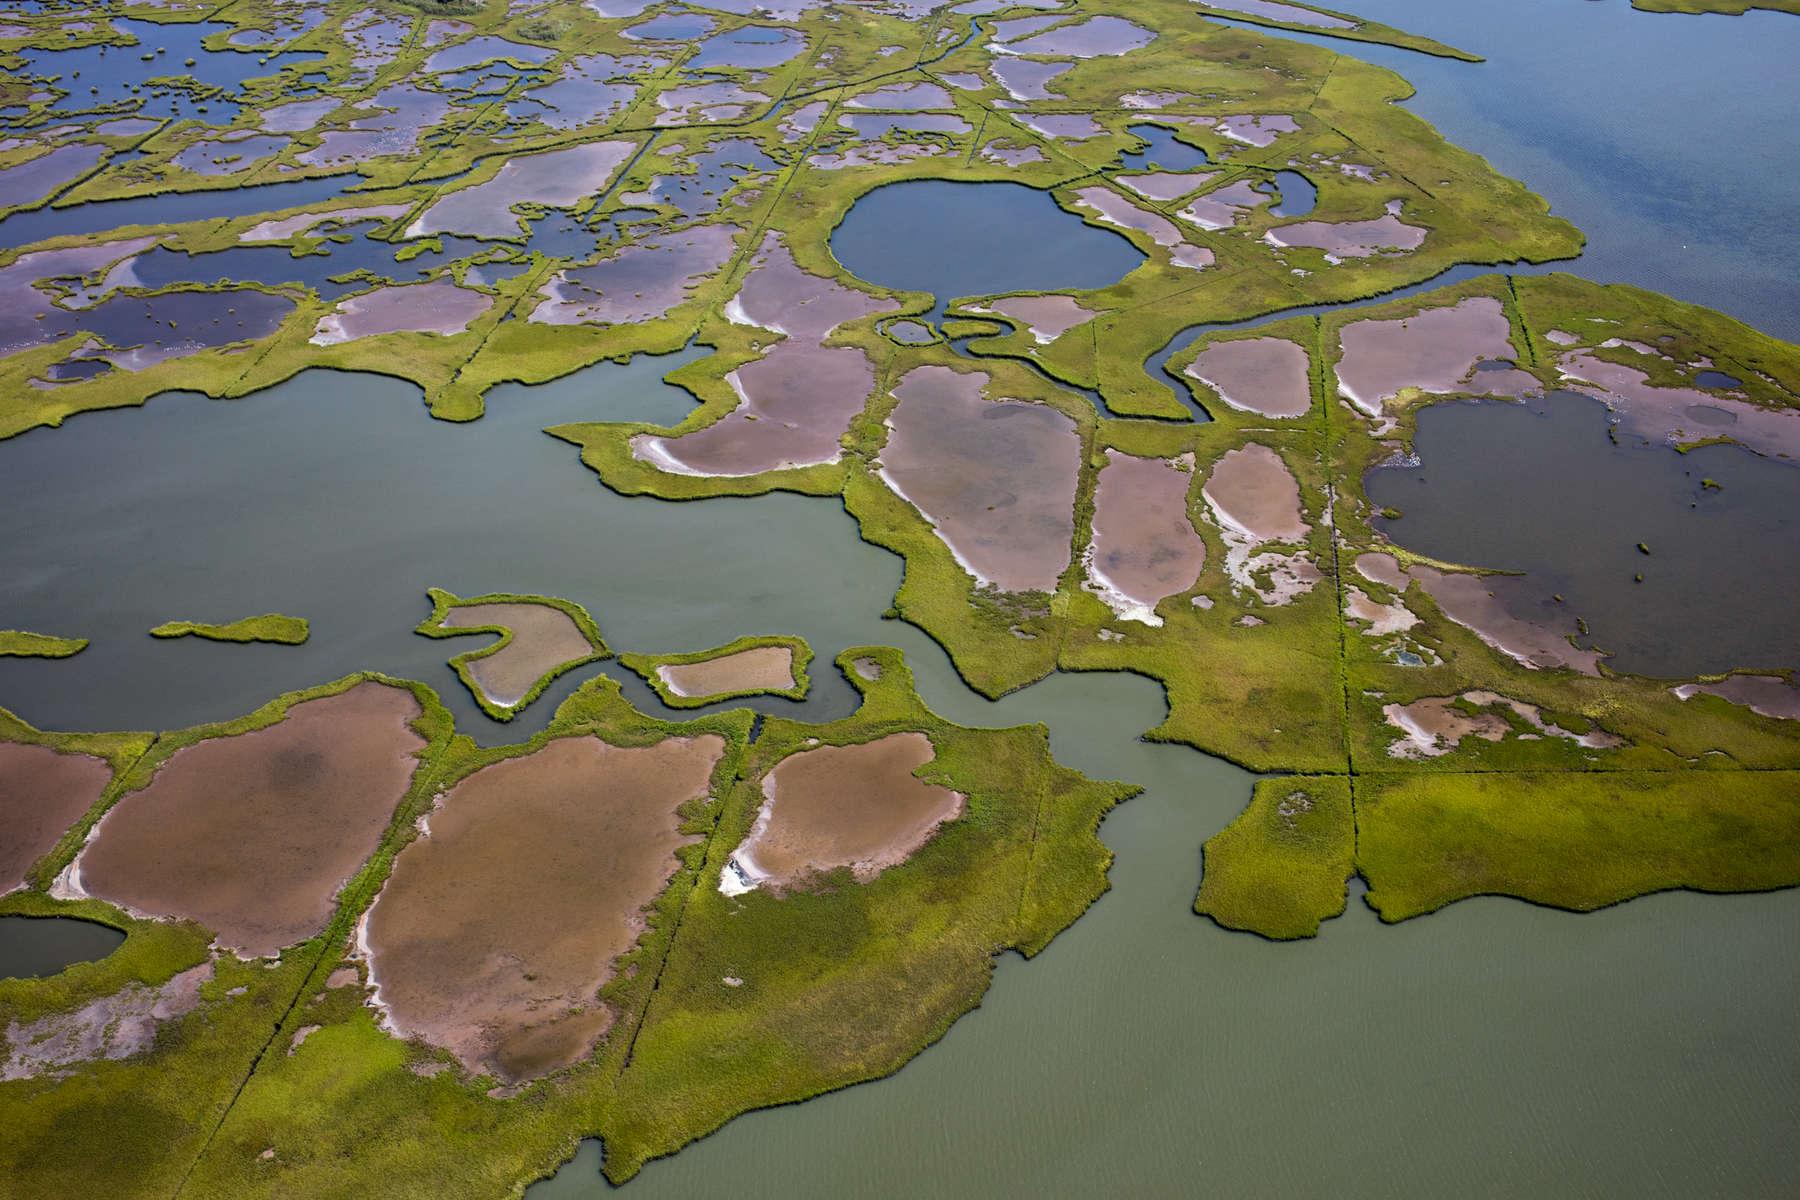 Wetland Marsh Ponds, Berlin, Maryland 2018 (180906-0172)